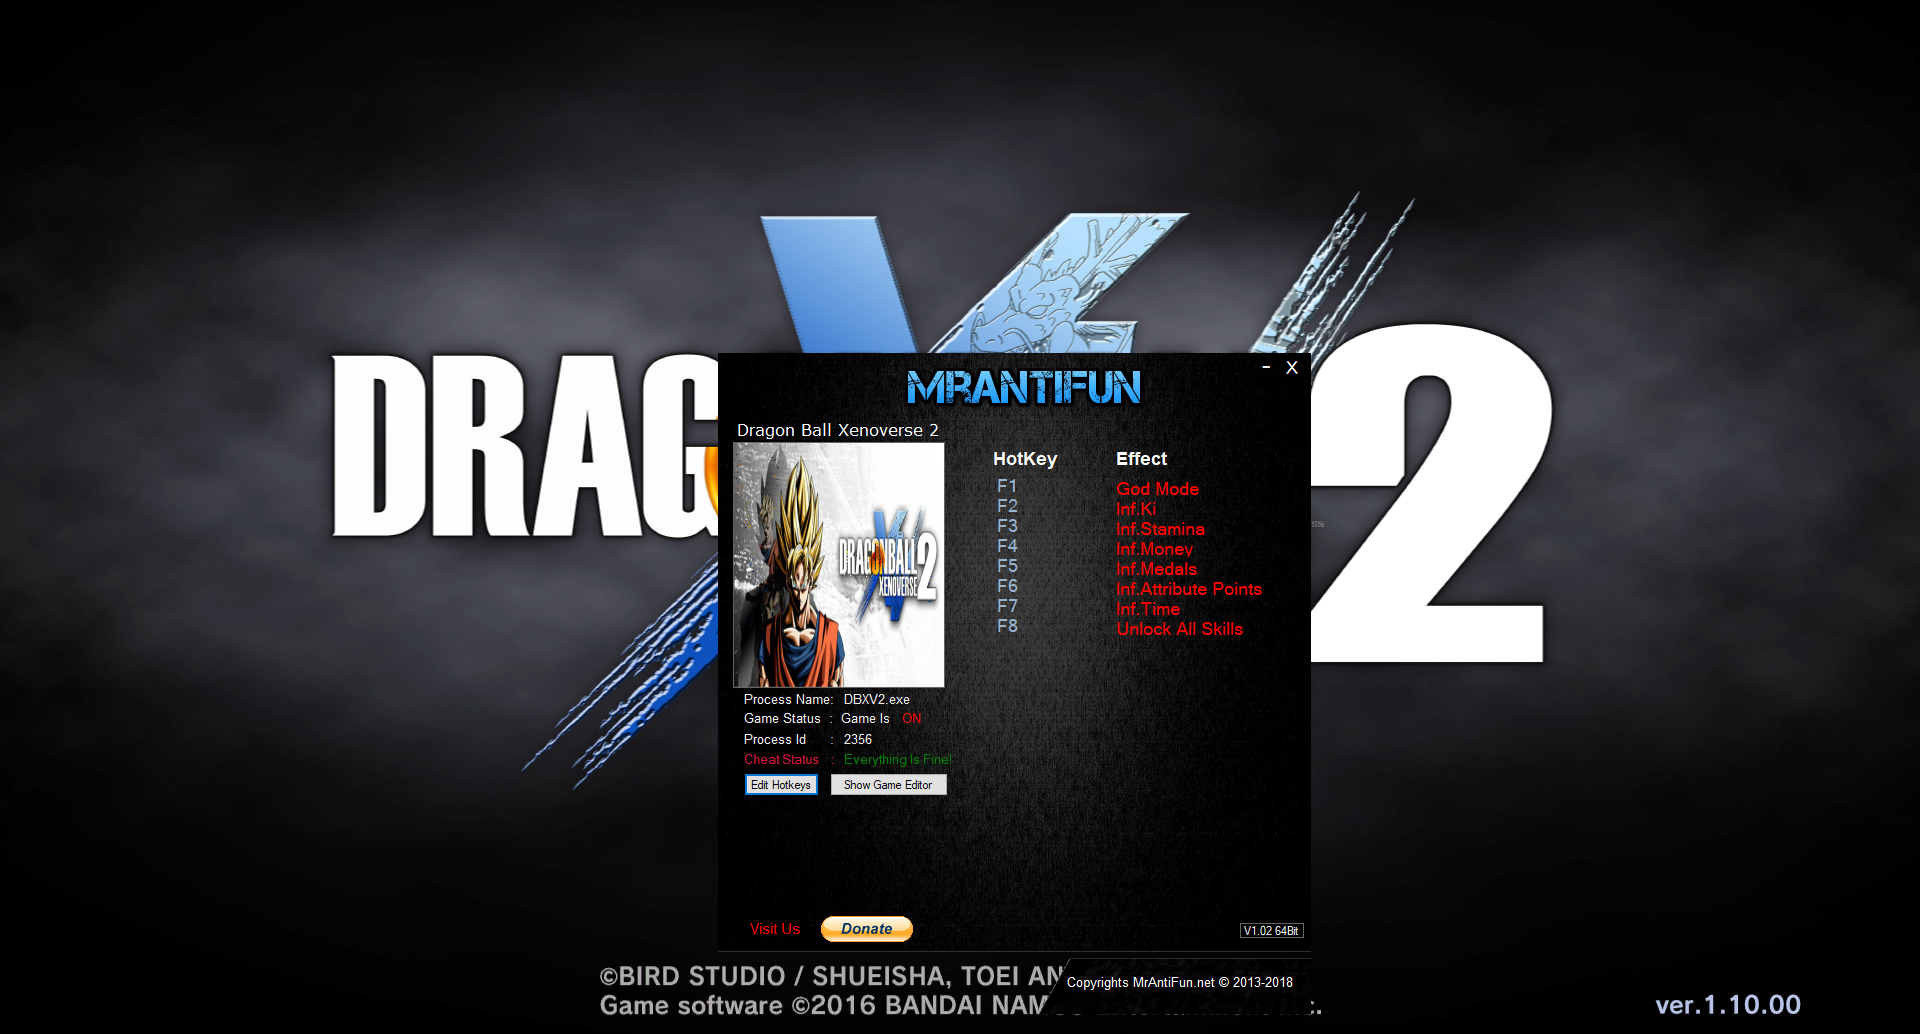 Ammco bus : Download trainer dragon ball xenoverse 2 mrantifun